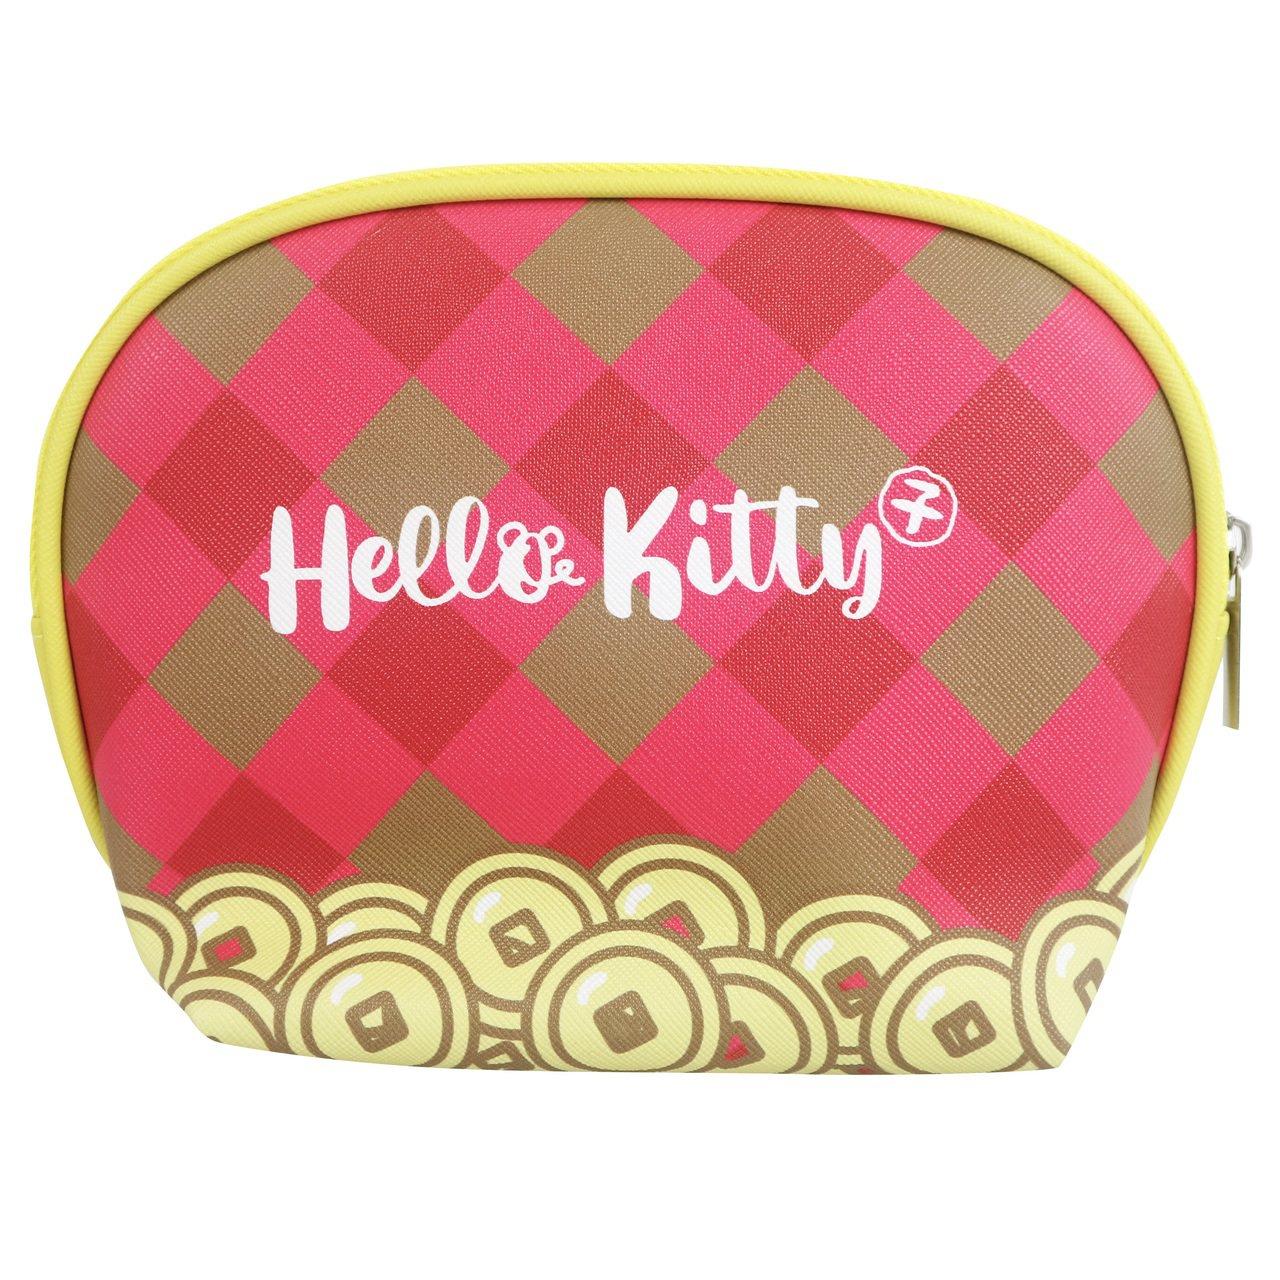 7-ELEVEN「Hello Kitty金鼠年限定萬用包」格紋款背面。圖/7-E...